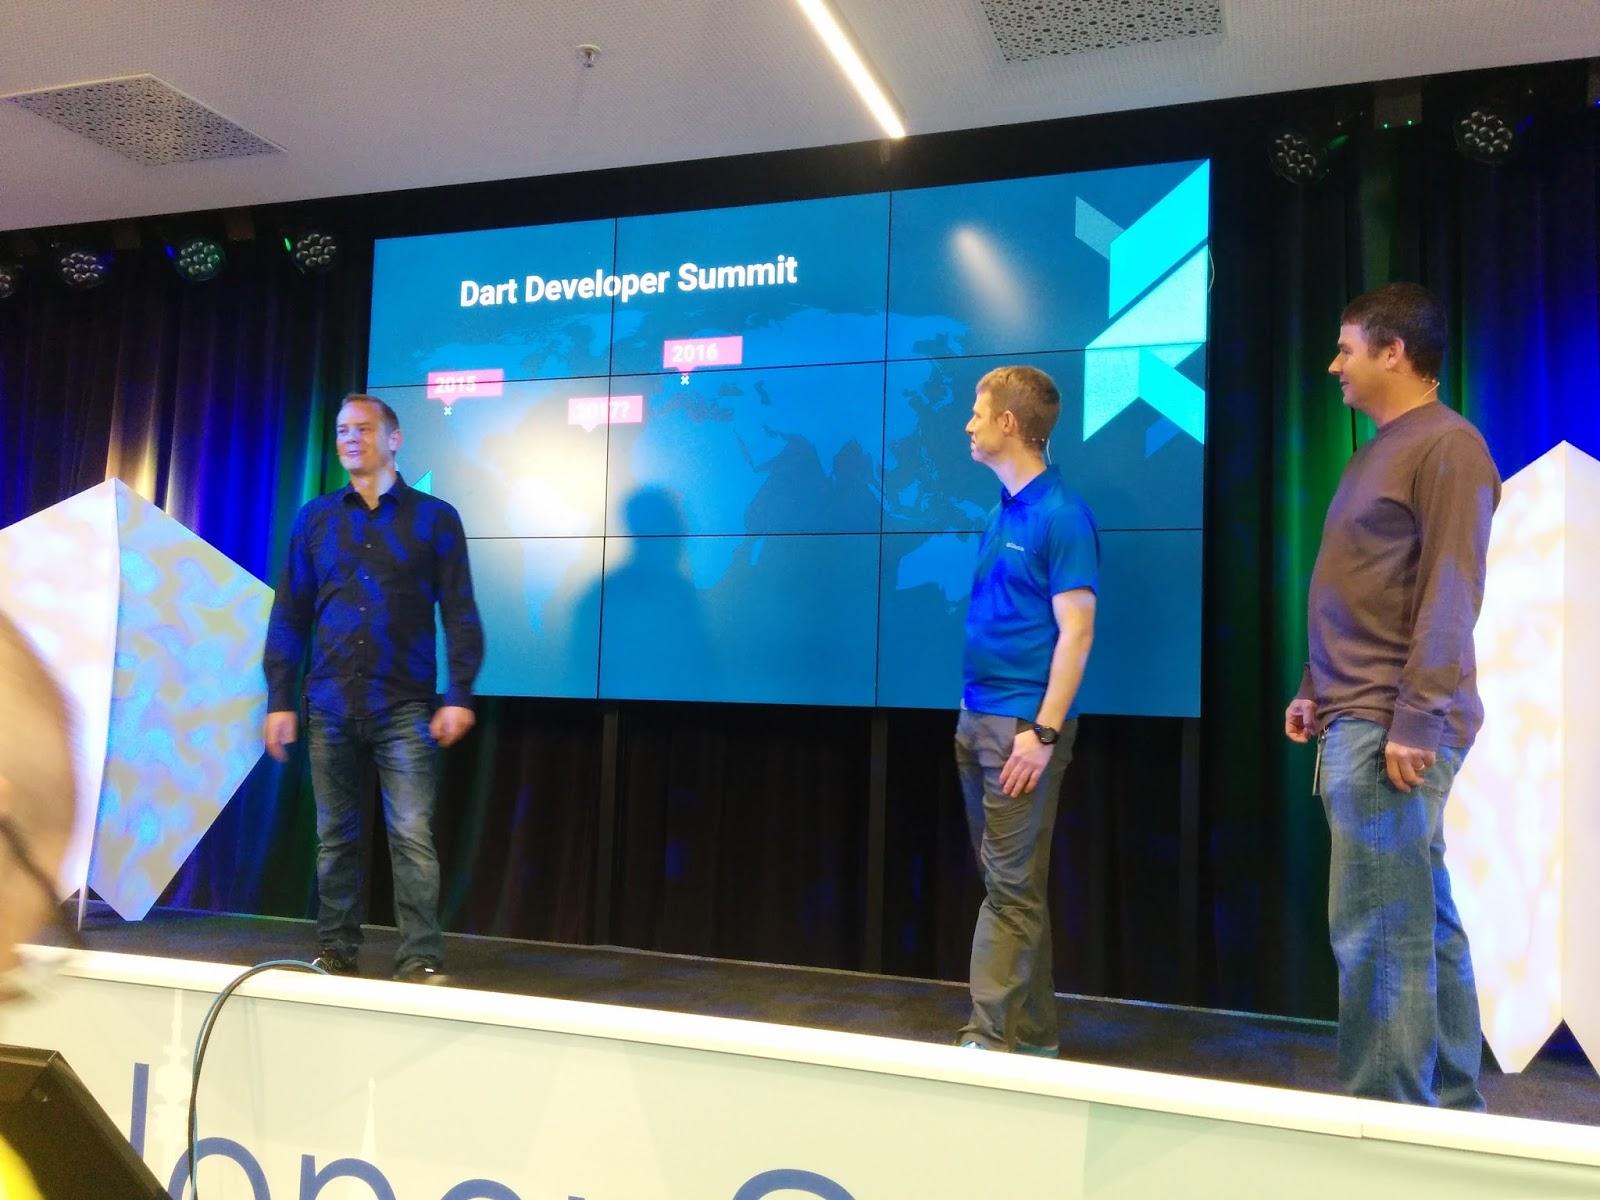 Jana Moudrá blog: Dart Developer Summit 2016